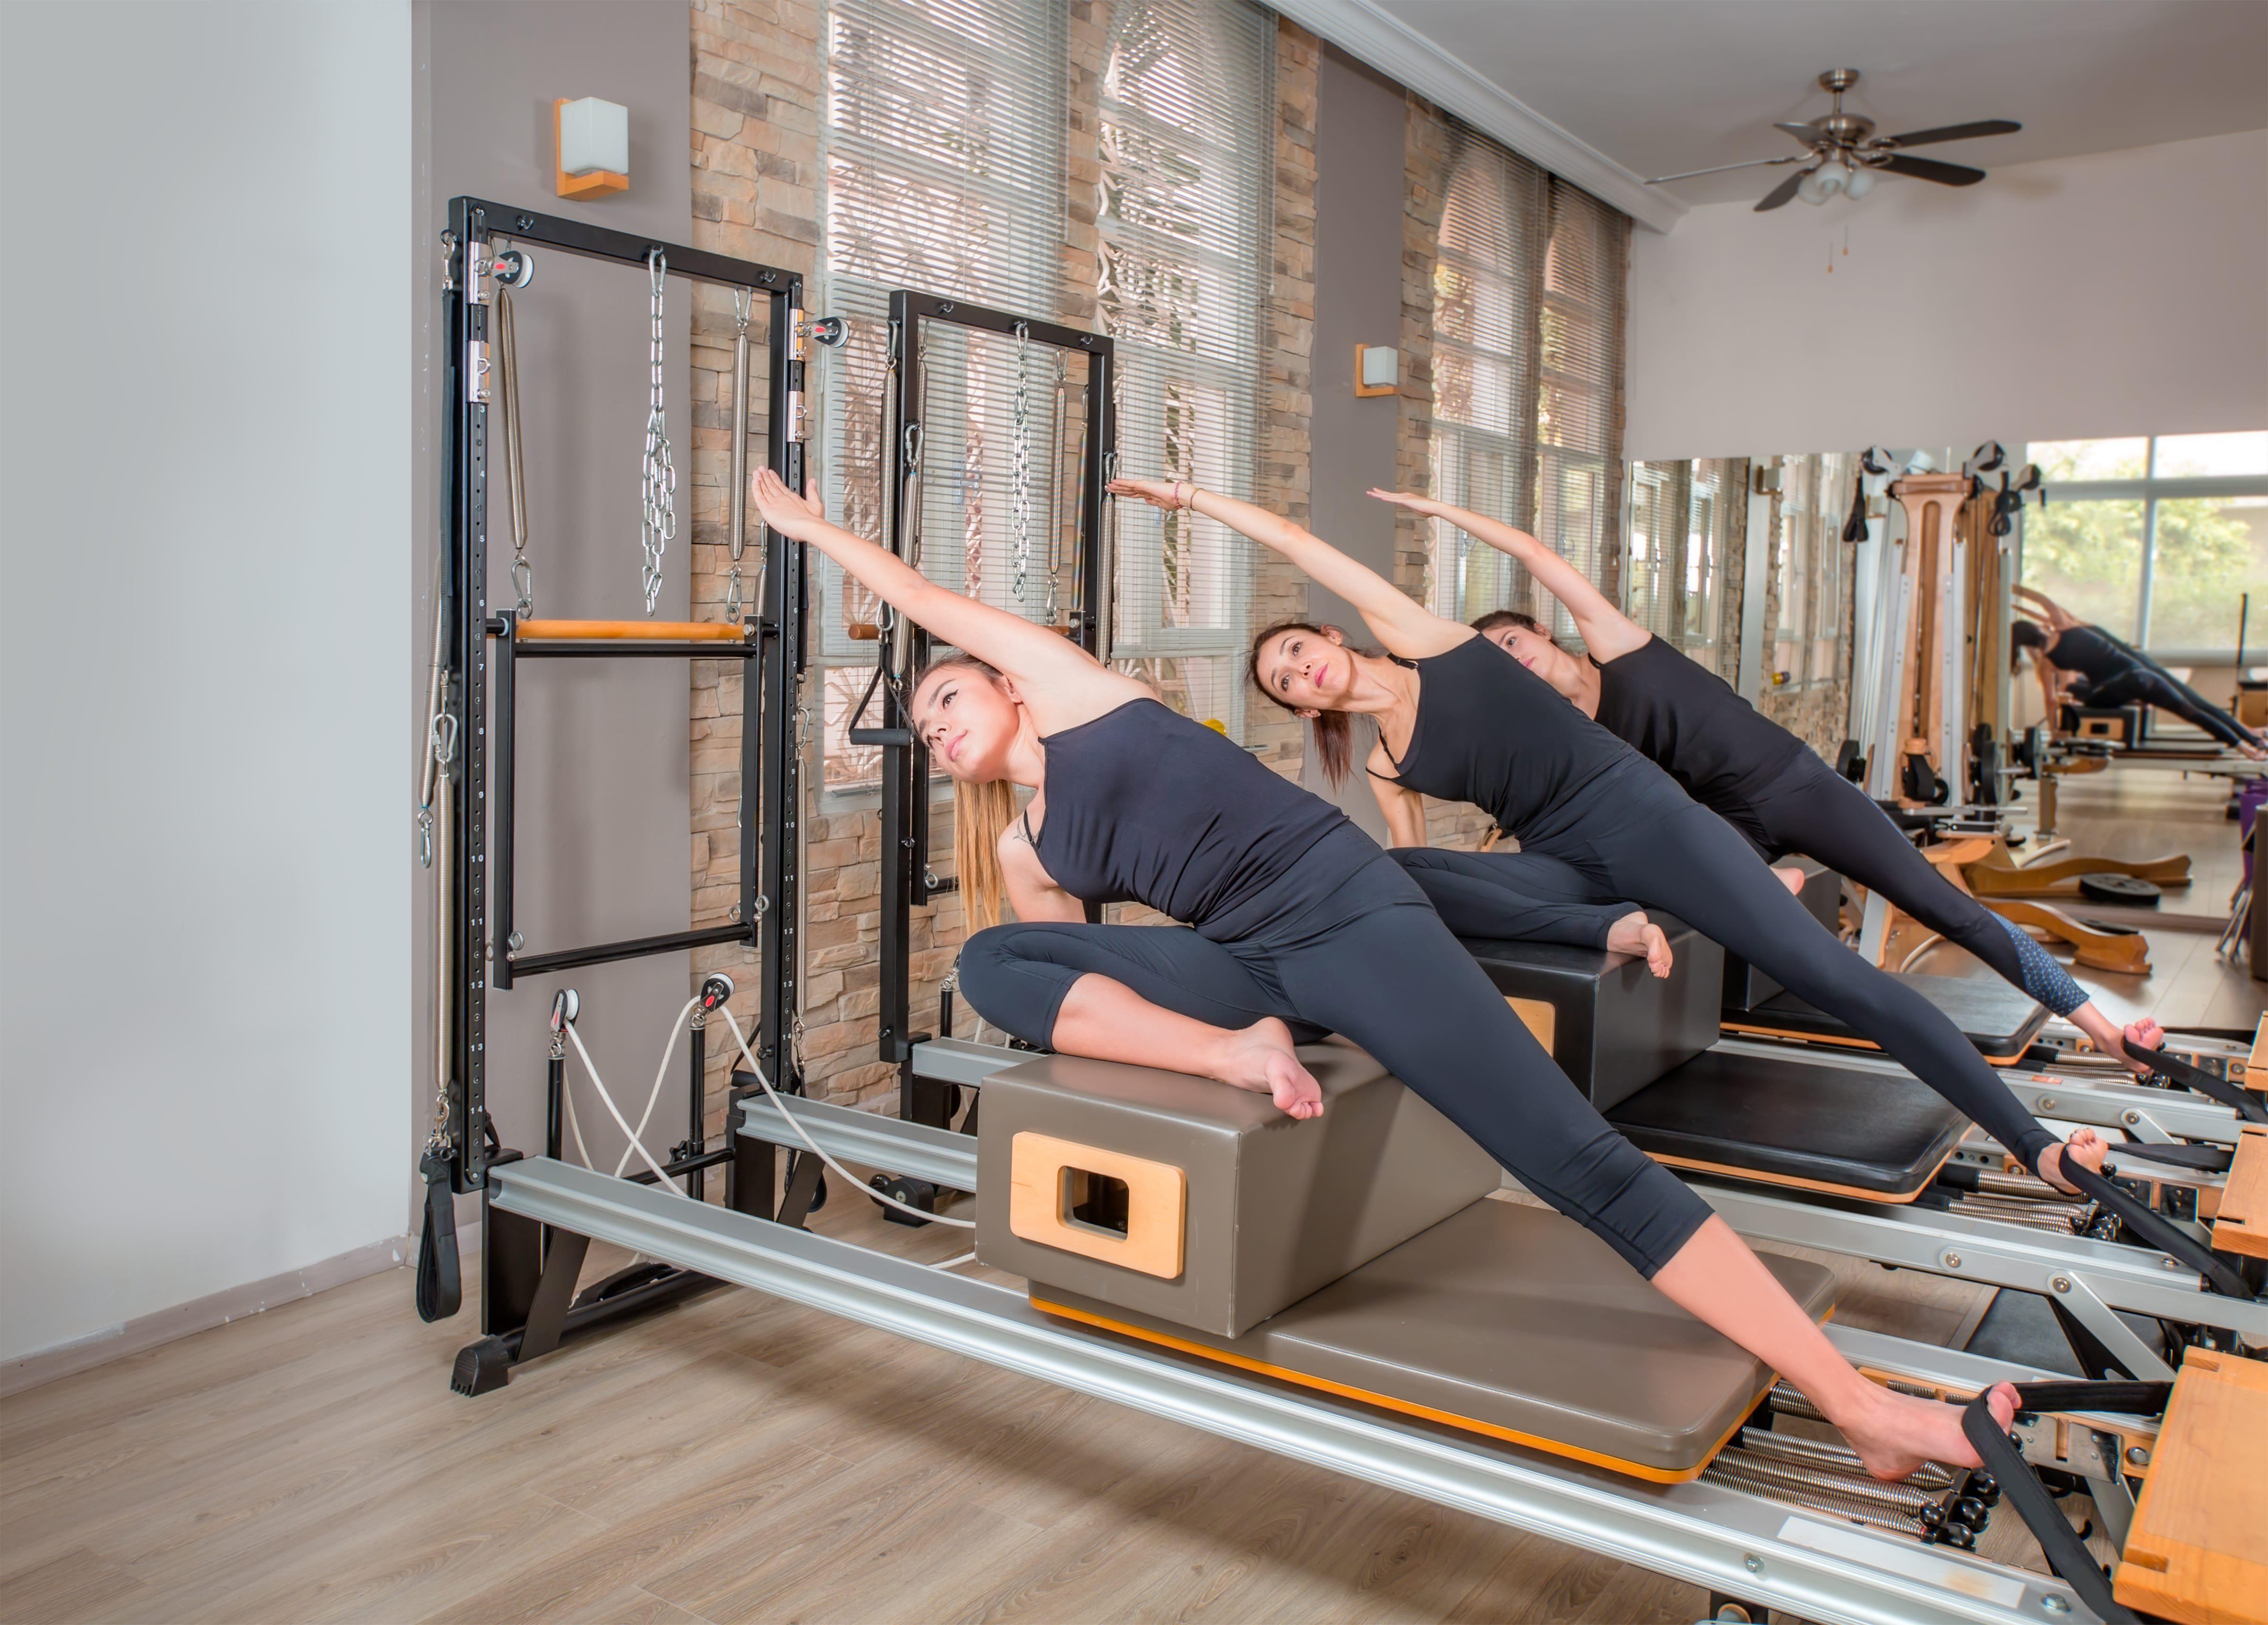 The Top 3 Pilates Studios in City West - Seven West